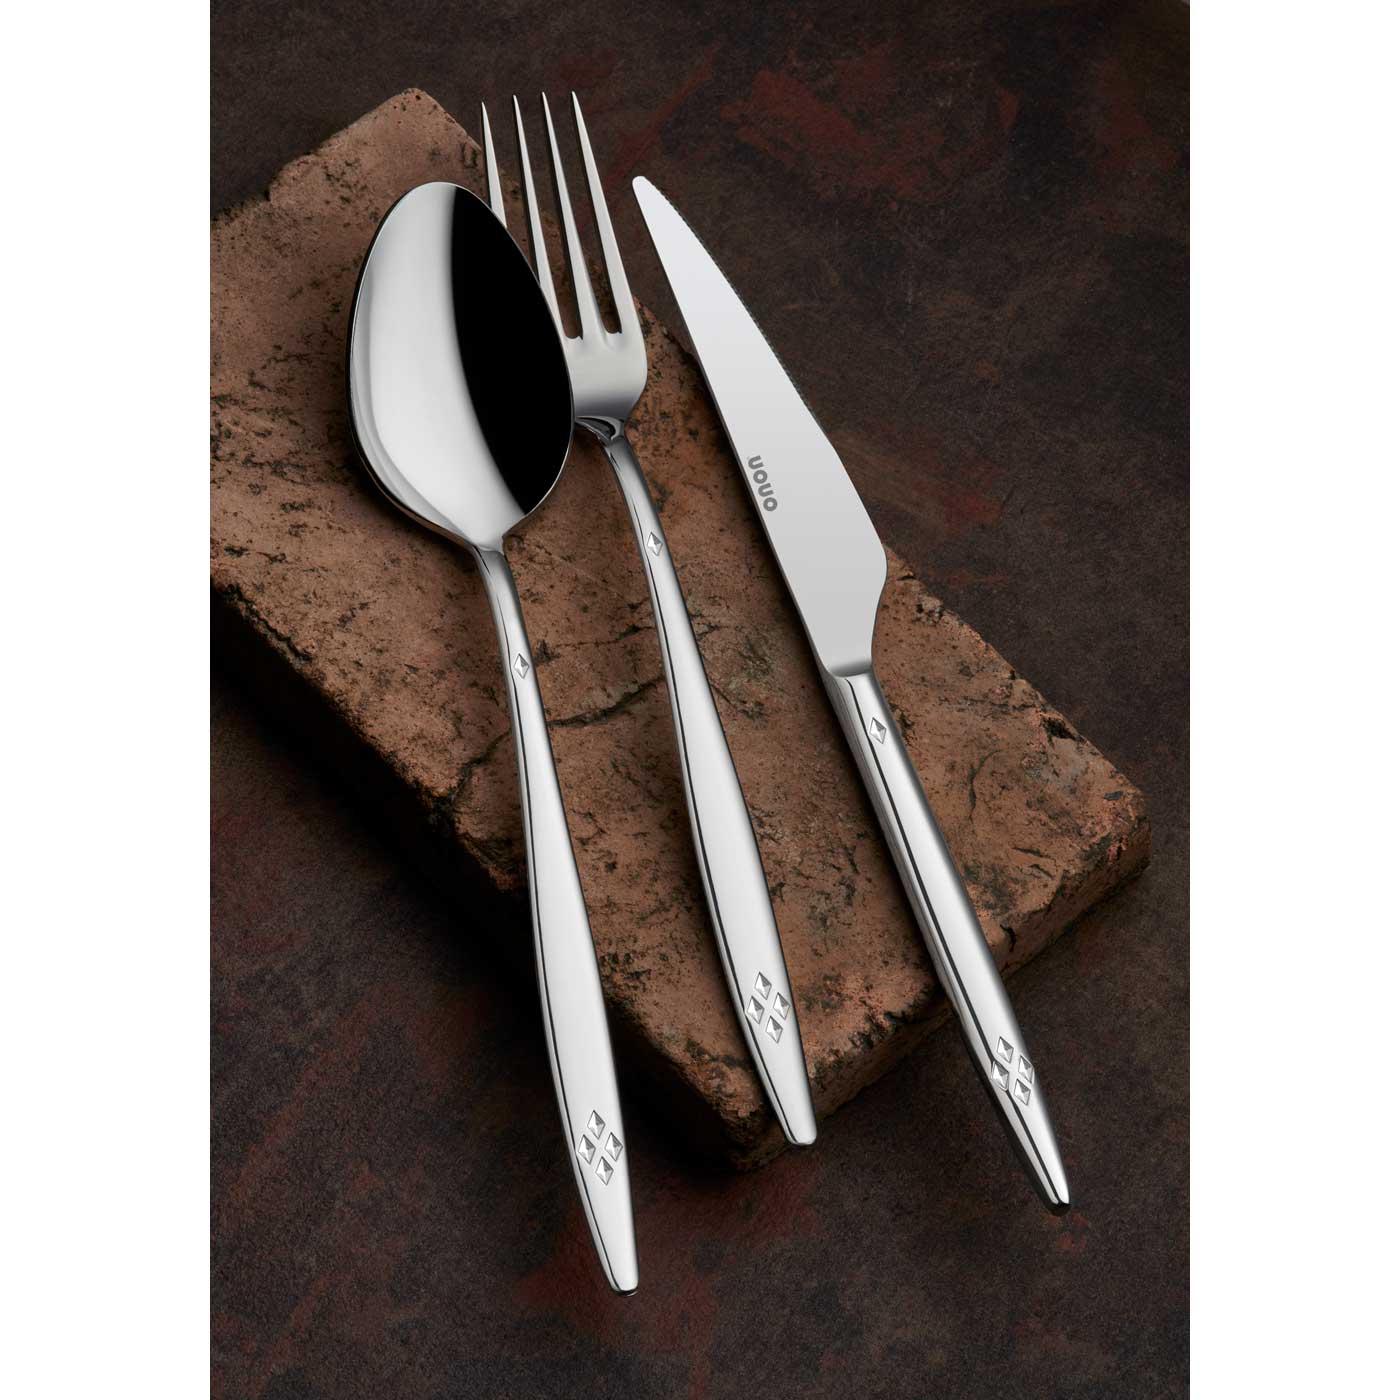 ONON Mira Sade 12 Adet Yemek Kaşığı 2